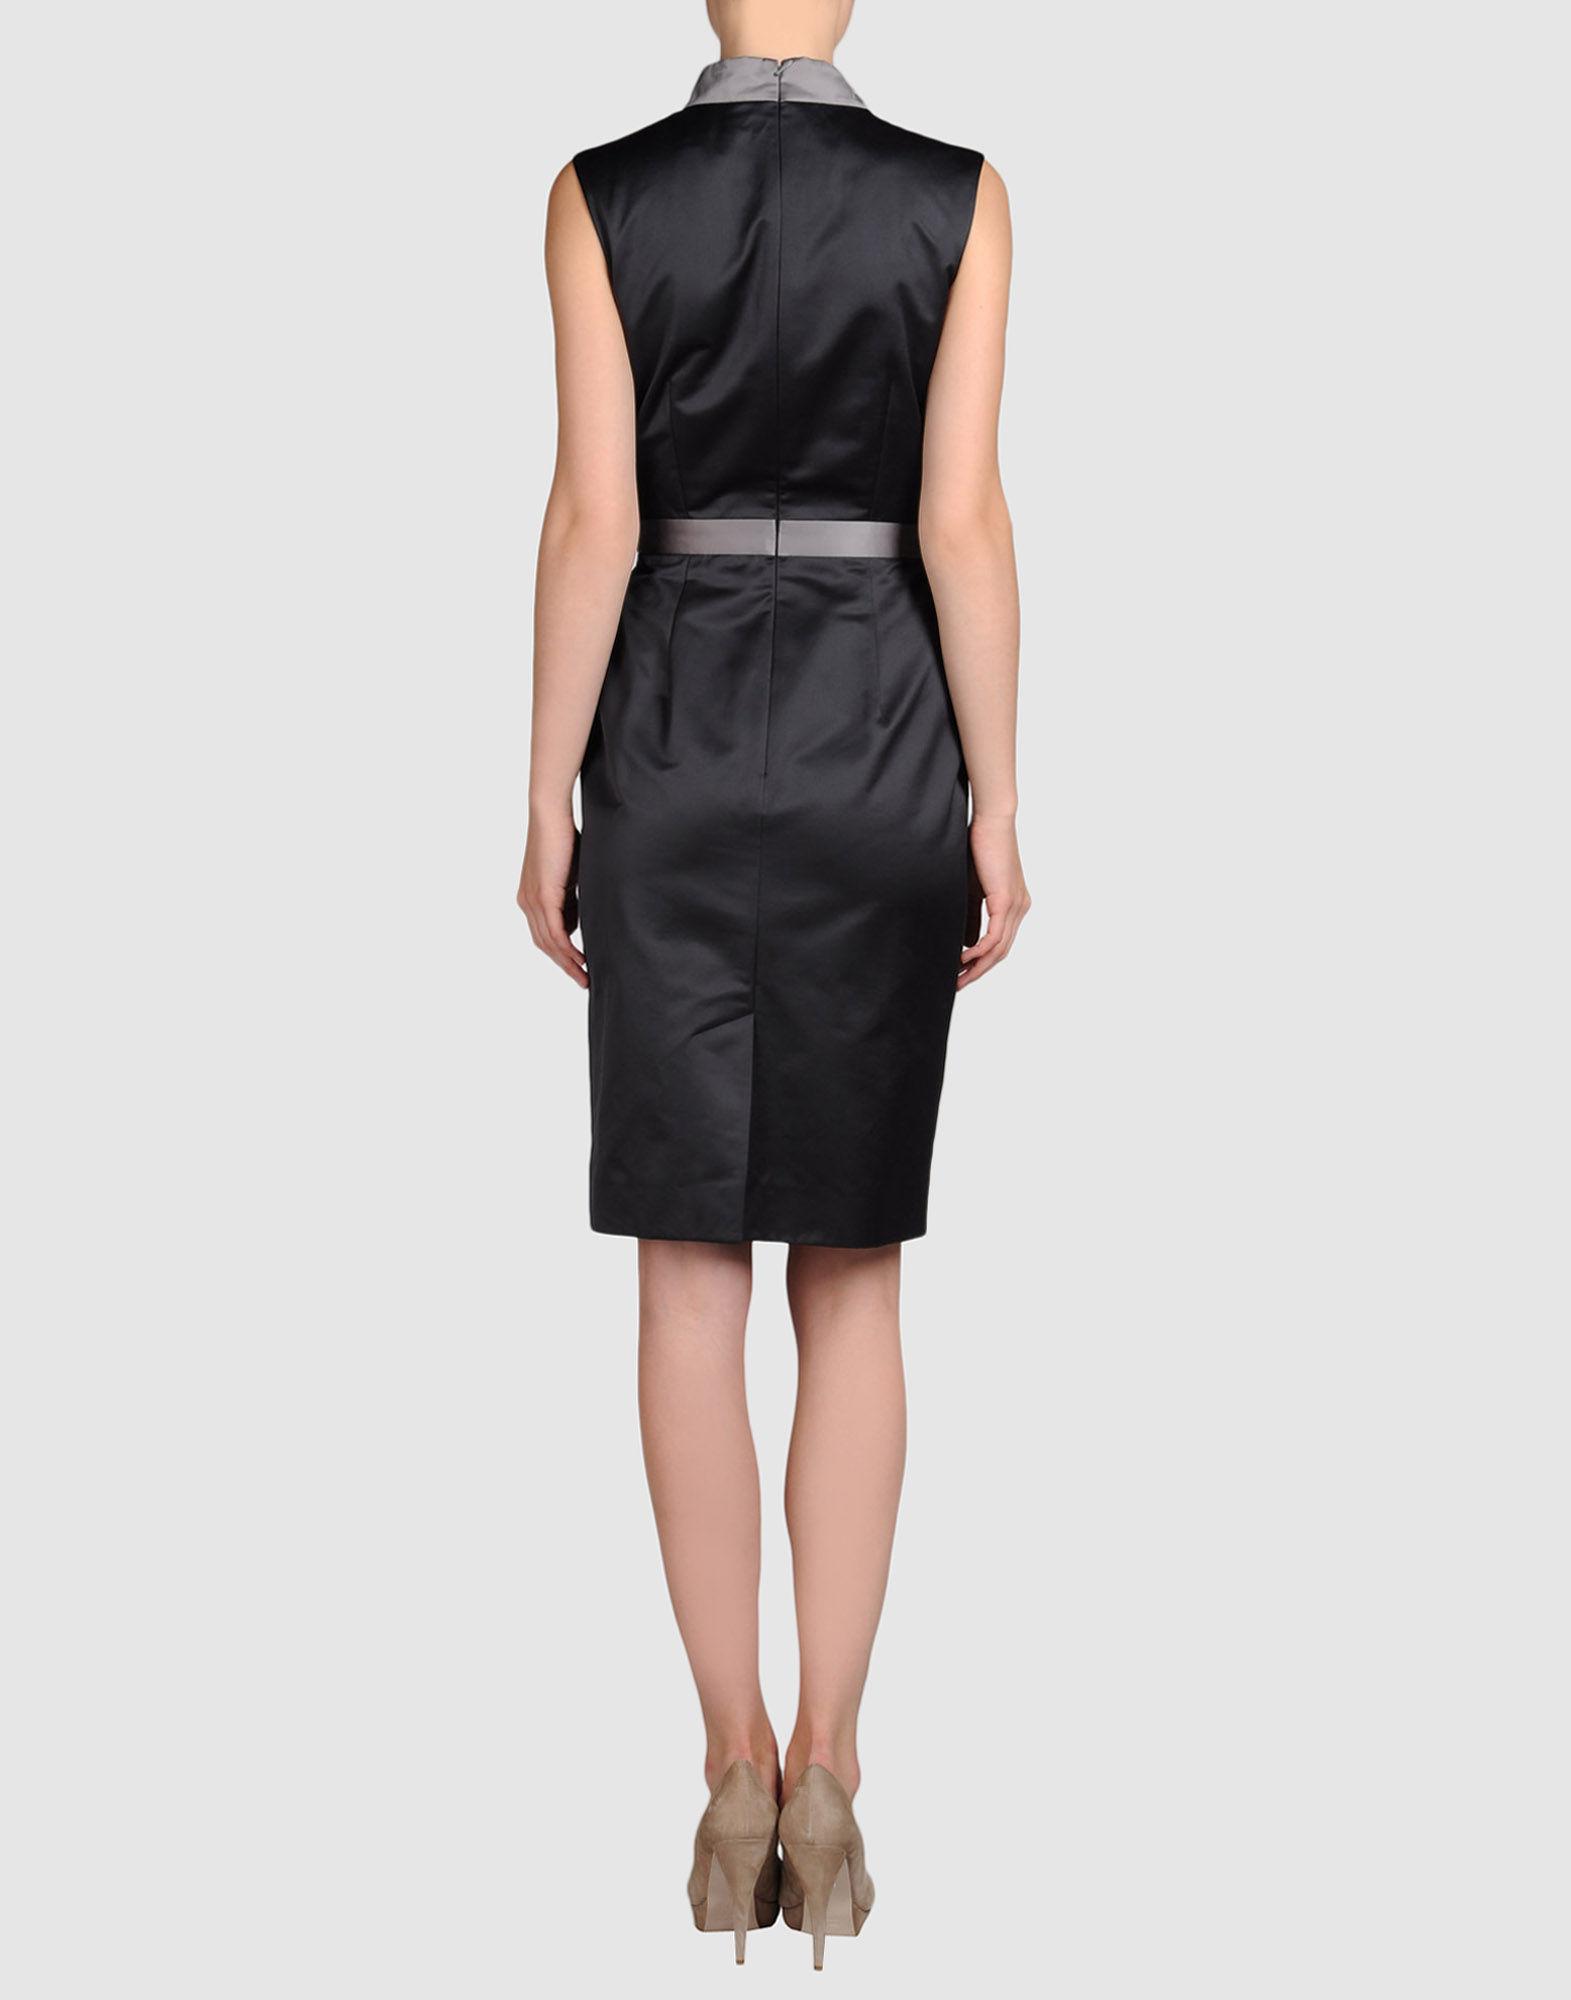 34219218QS 14 r - Βραδυνα Φορεματα Yves Saint Laurent Rive Gauche Κωδ.32